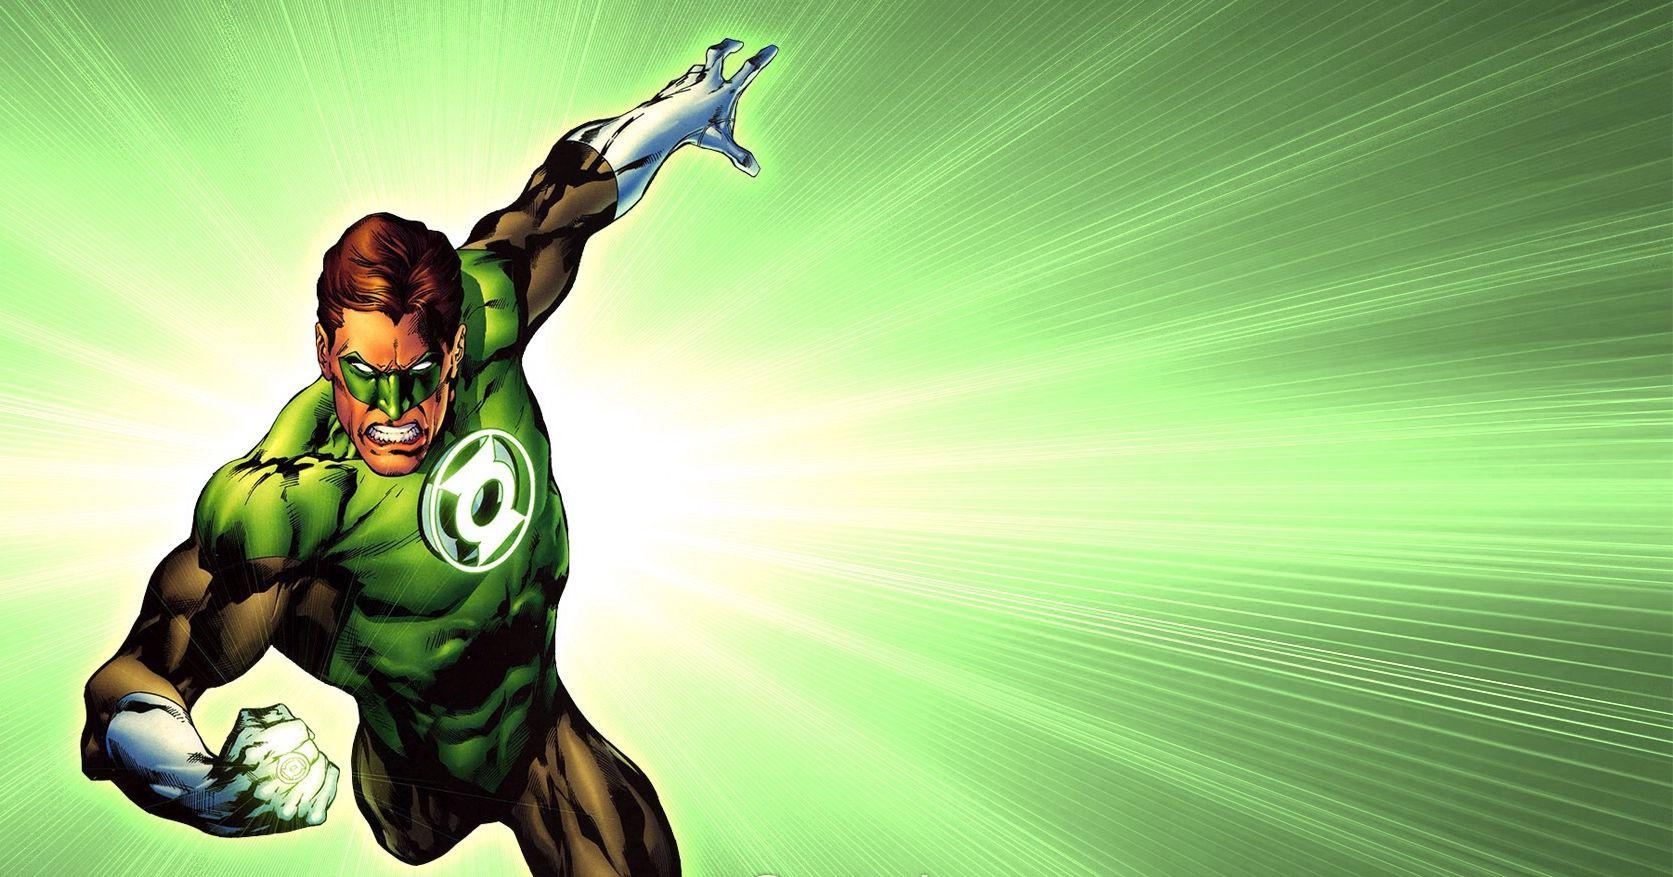 Green Lantern May Appear in 'Batman v Superman' Justice ...